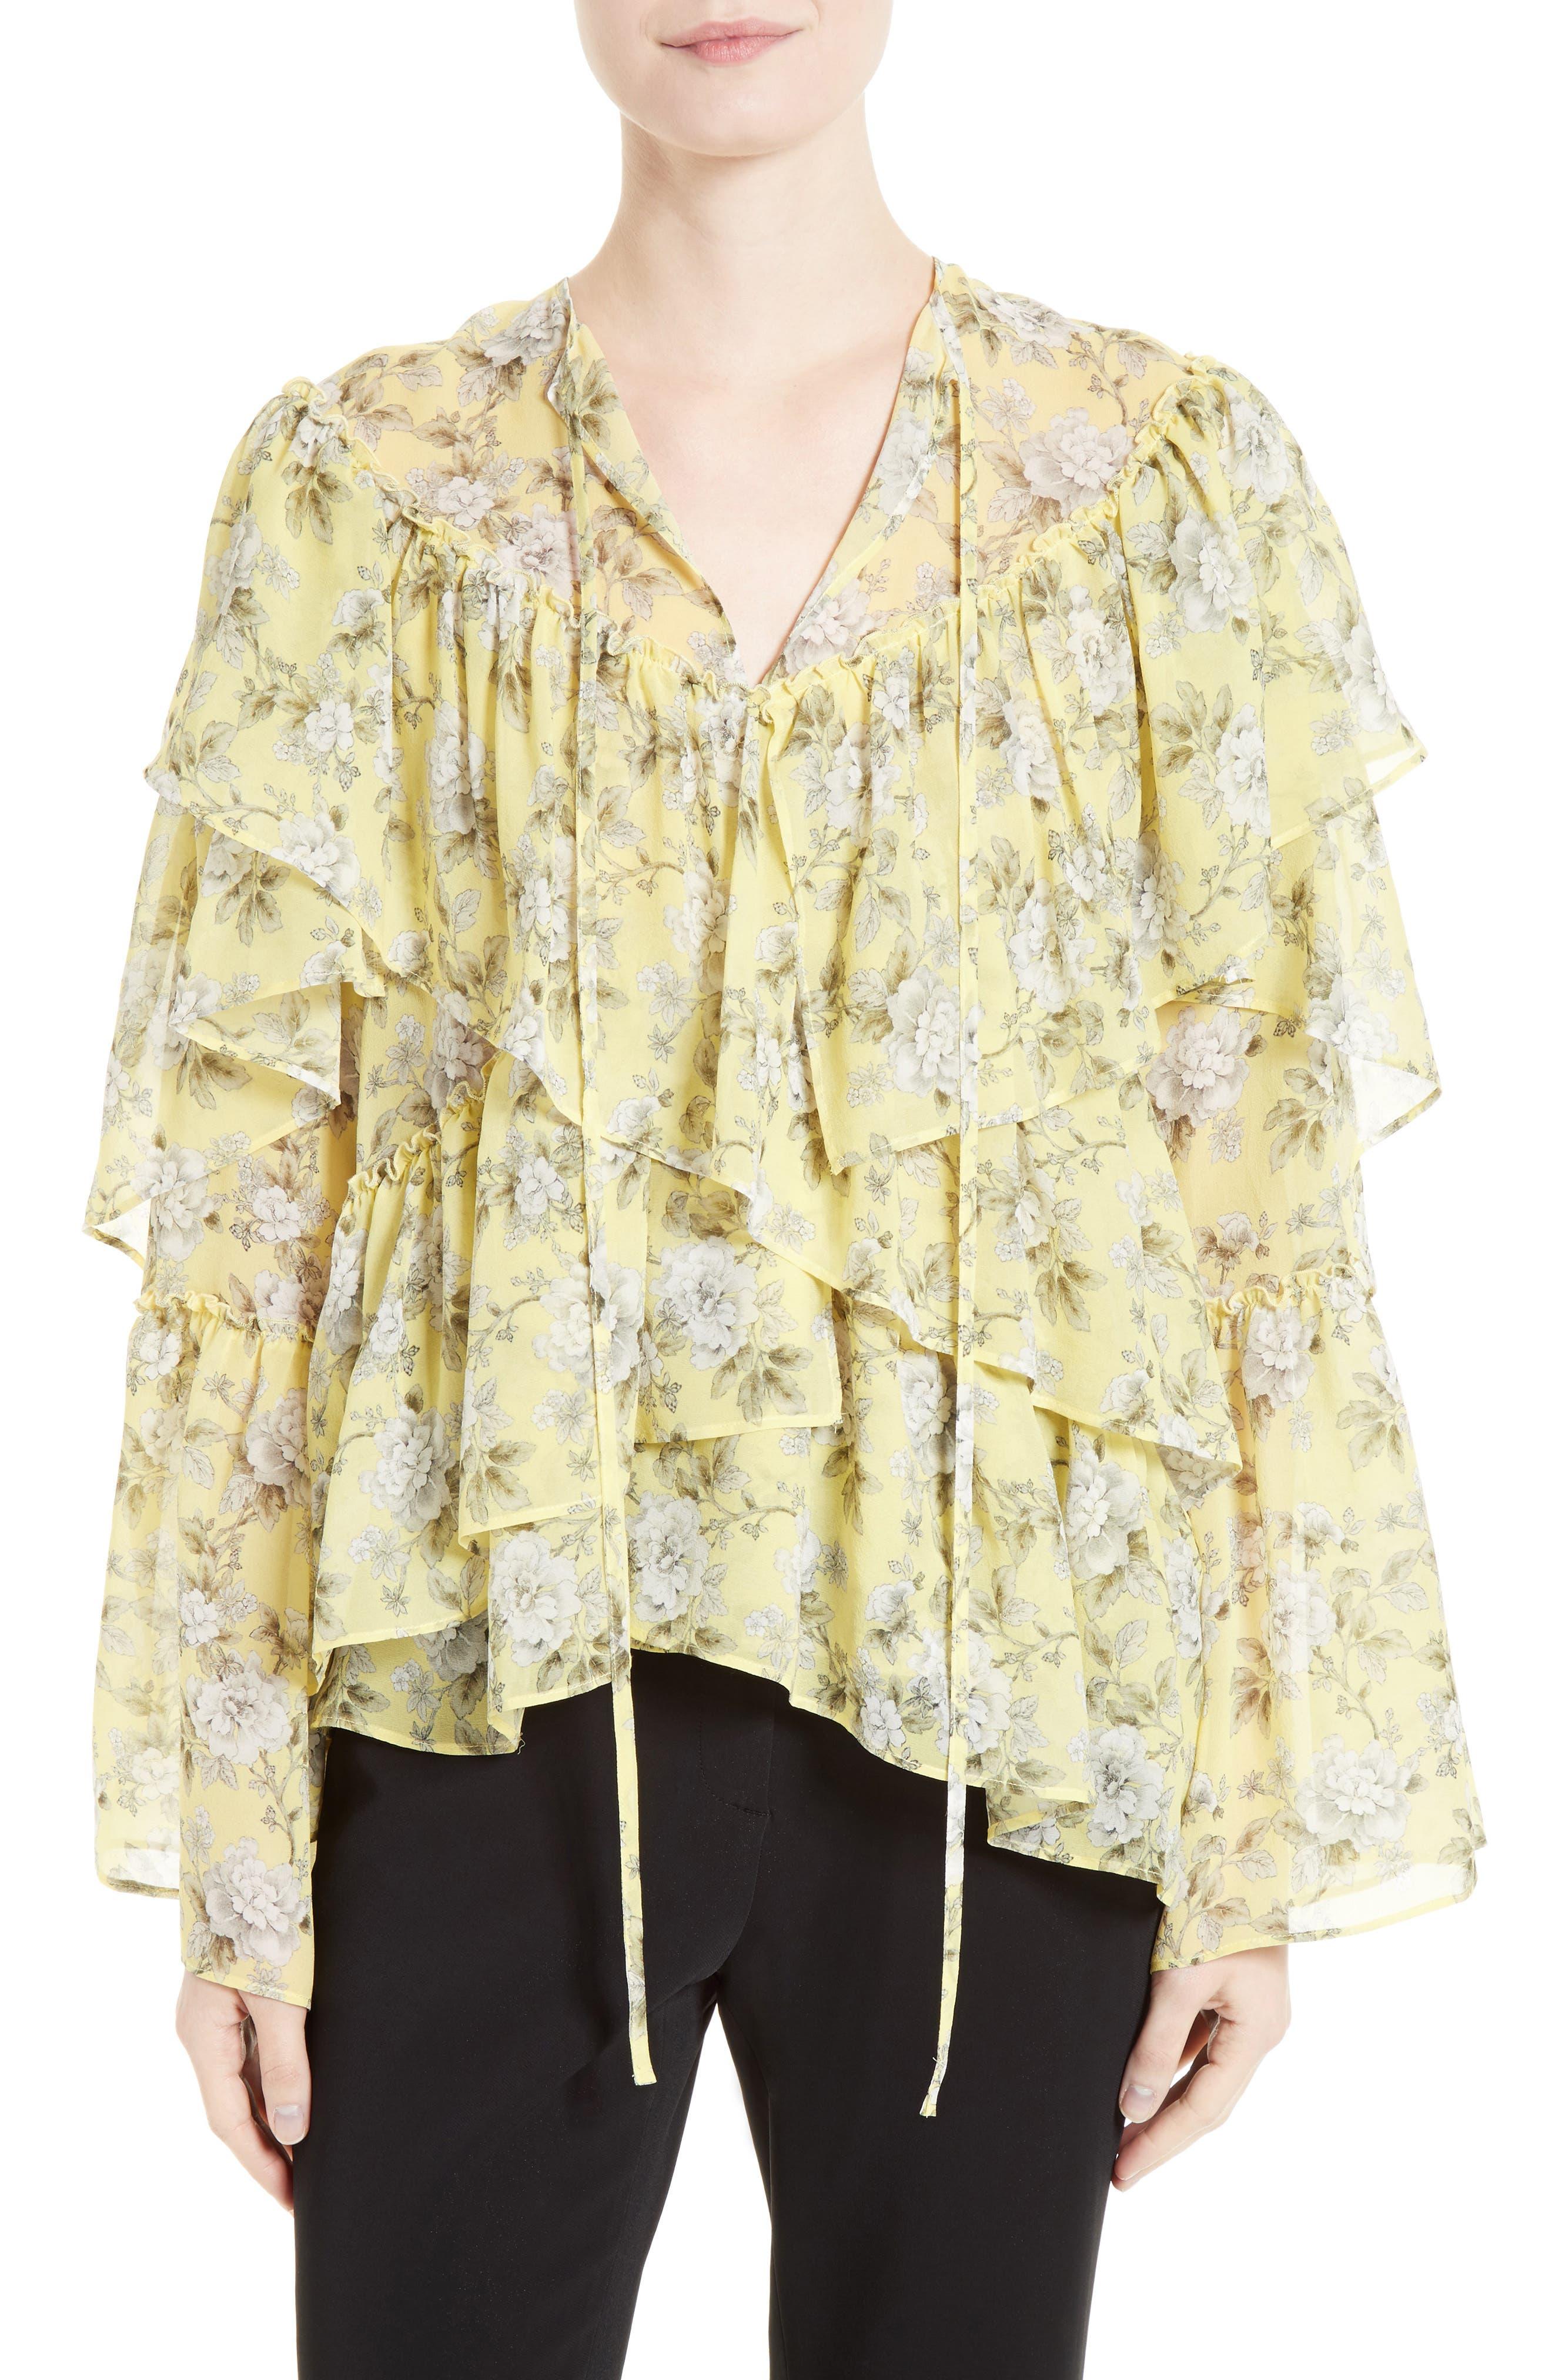 Alternate Image 1 Selected - Robert Rodriguez Ruffle Floral Print Silk Blouse